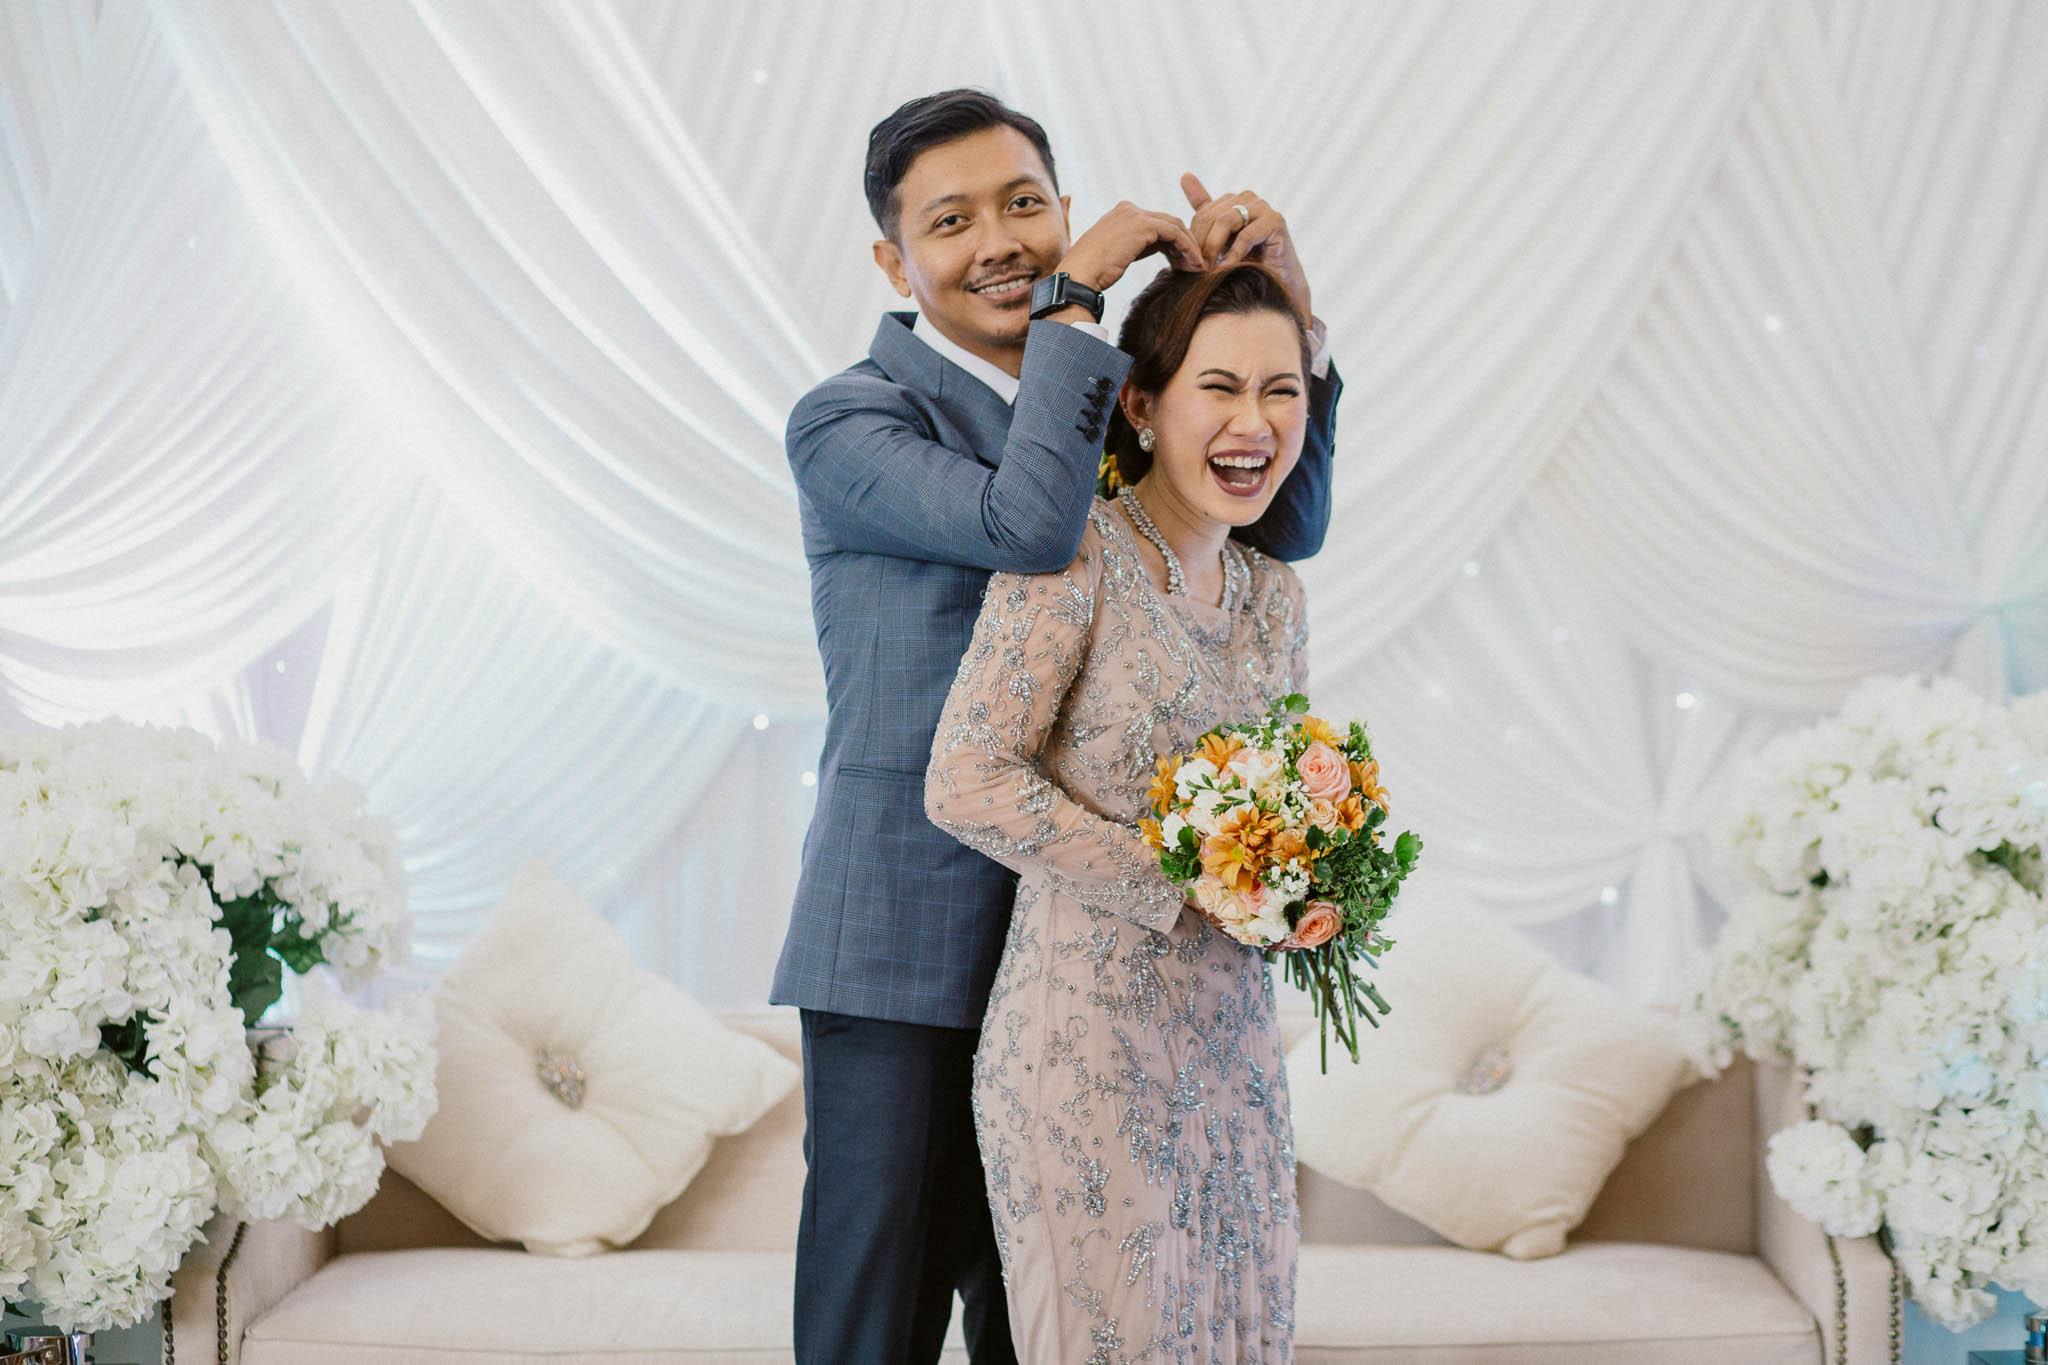 singapore-wedding-photographer-wedding-nufail-addafiq-064.jpg